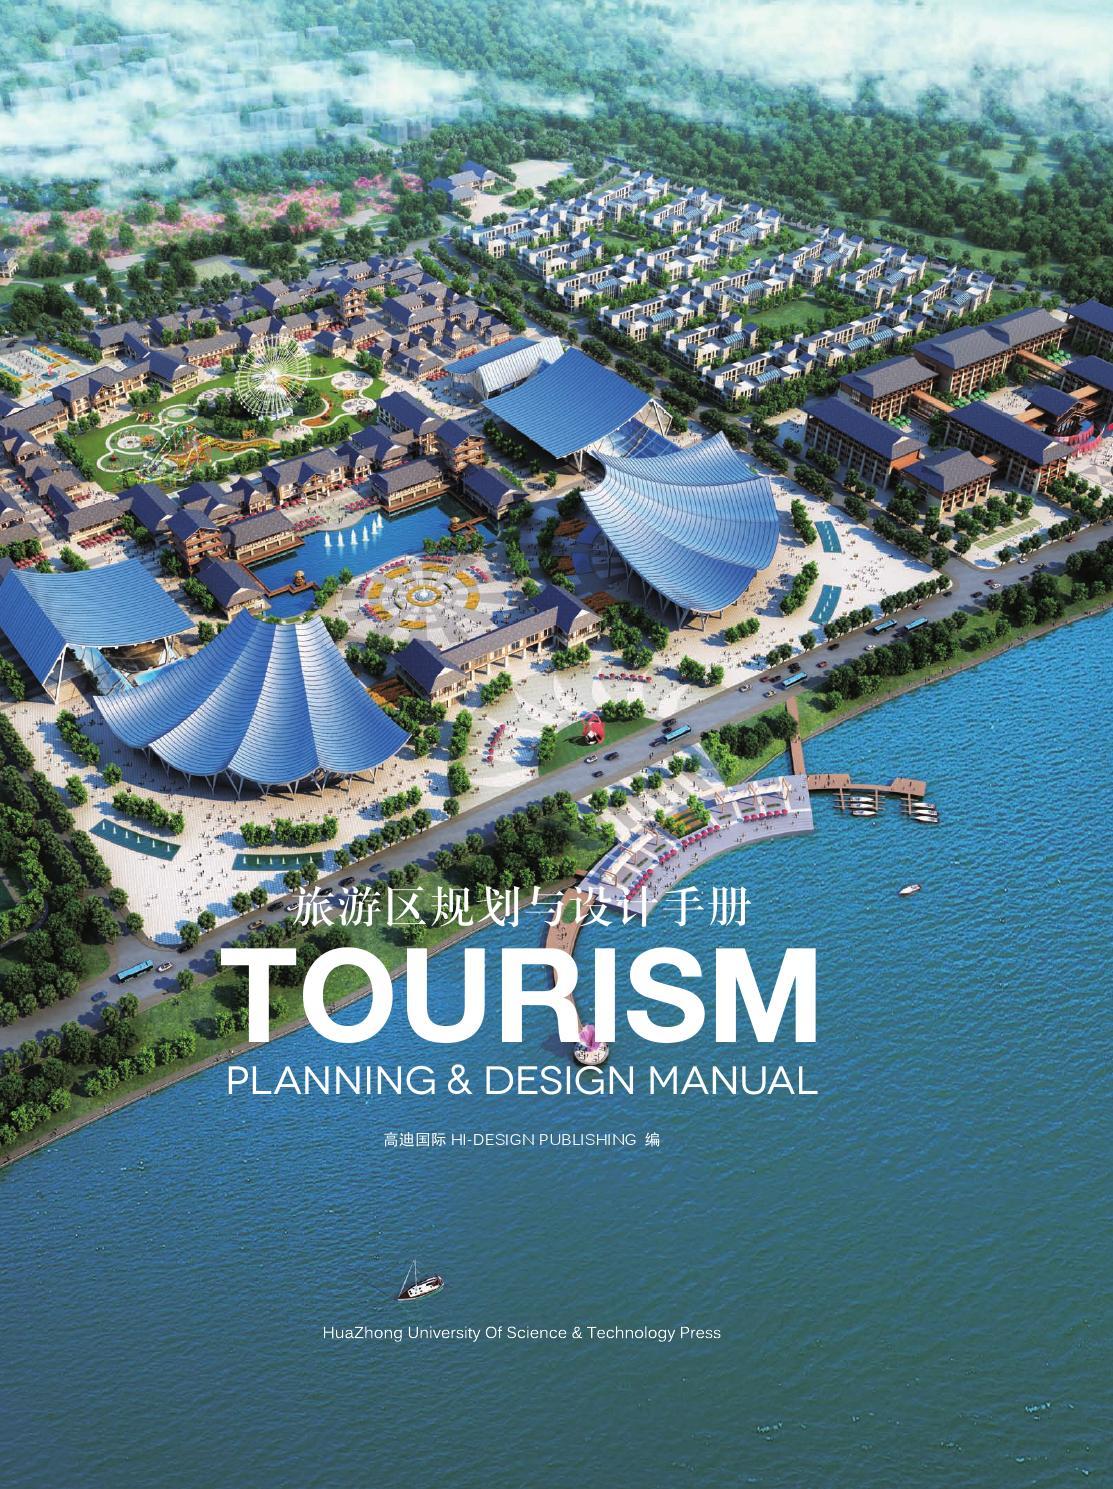 Tourism Planning Design Manual By Hi Design International Publishing Hk Co Ltd Issuu